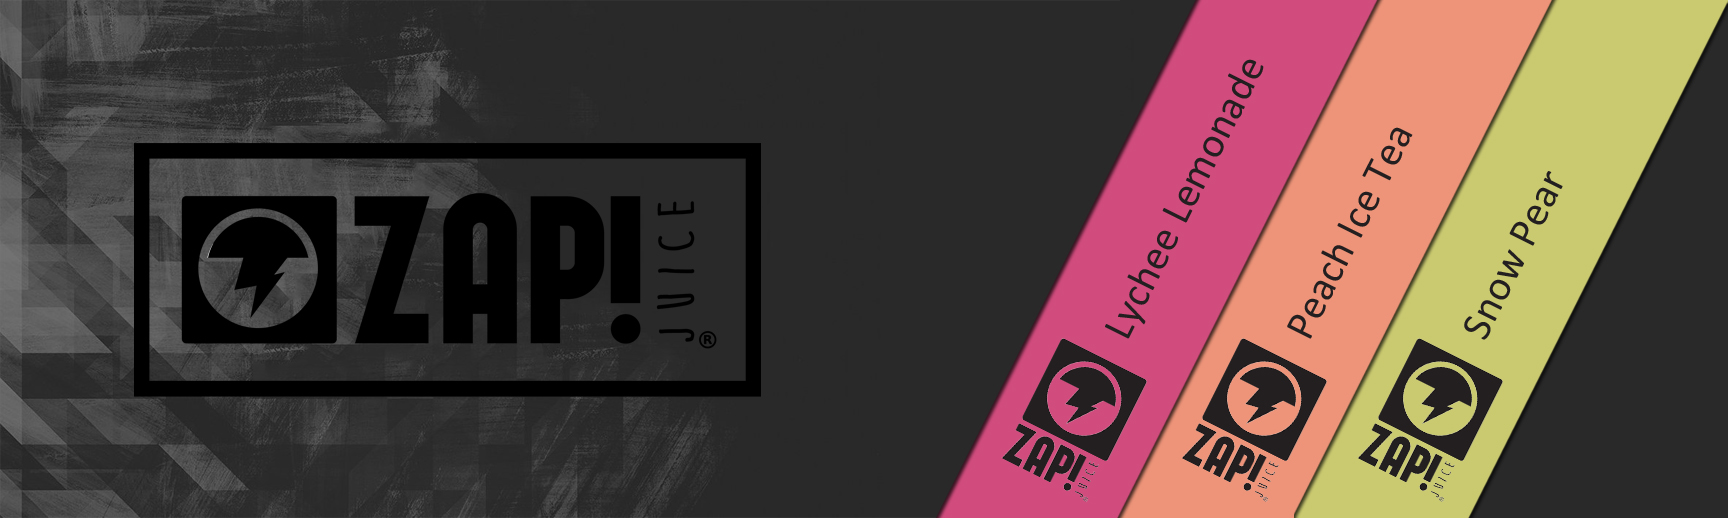 zap-juice-banner-www.vapetime.co.uk.jpg